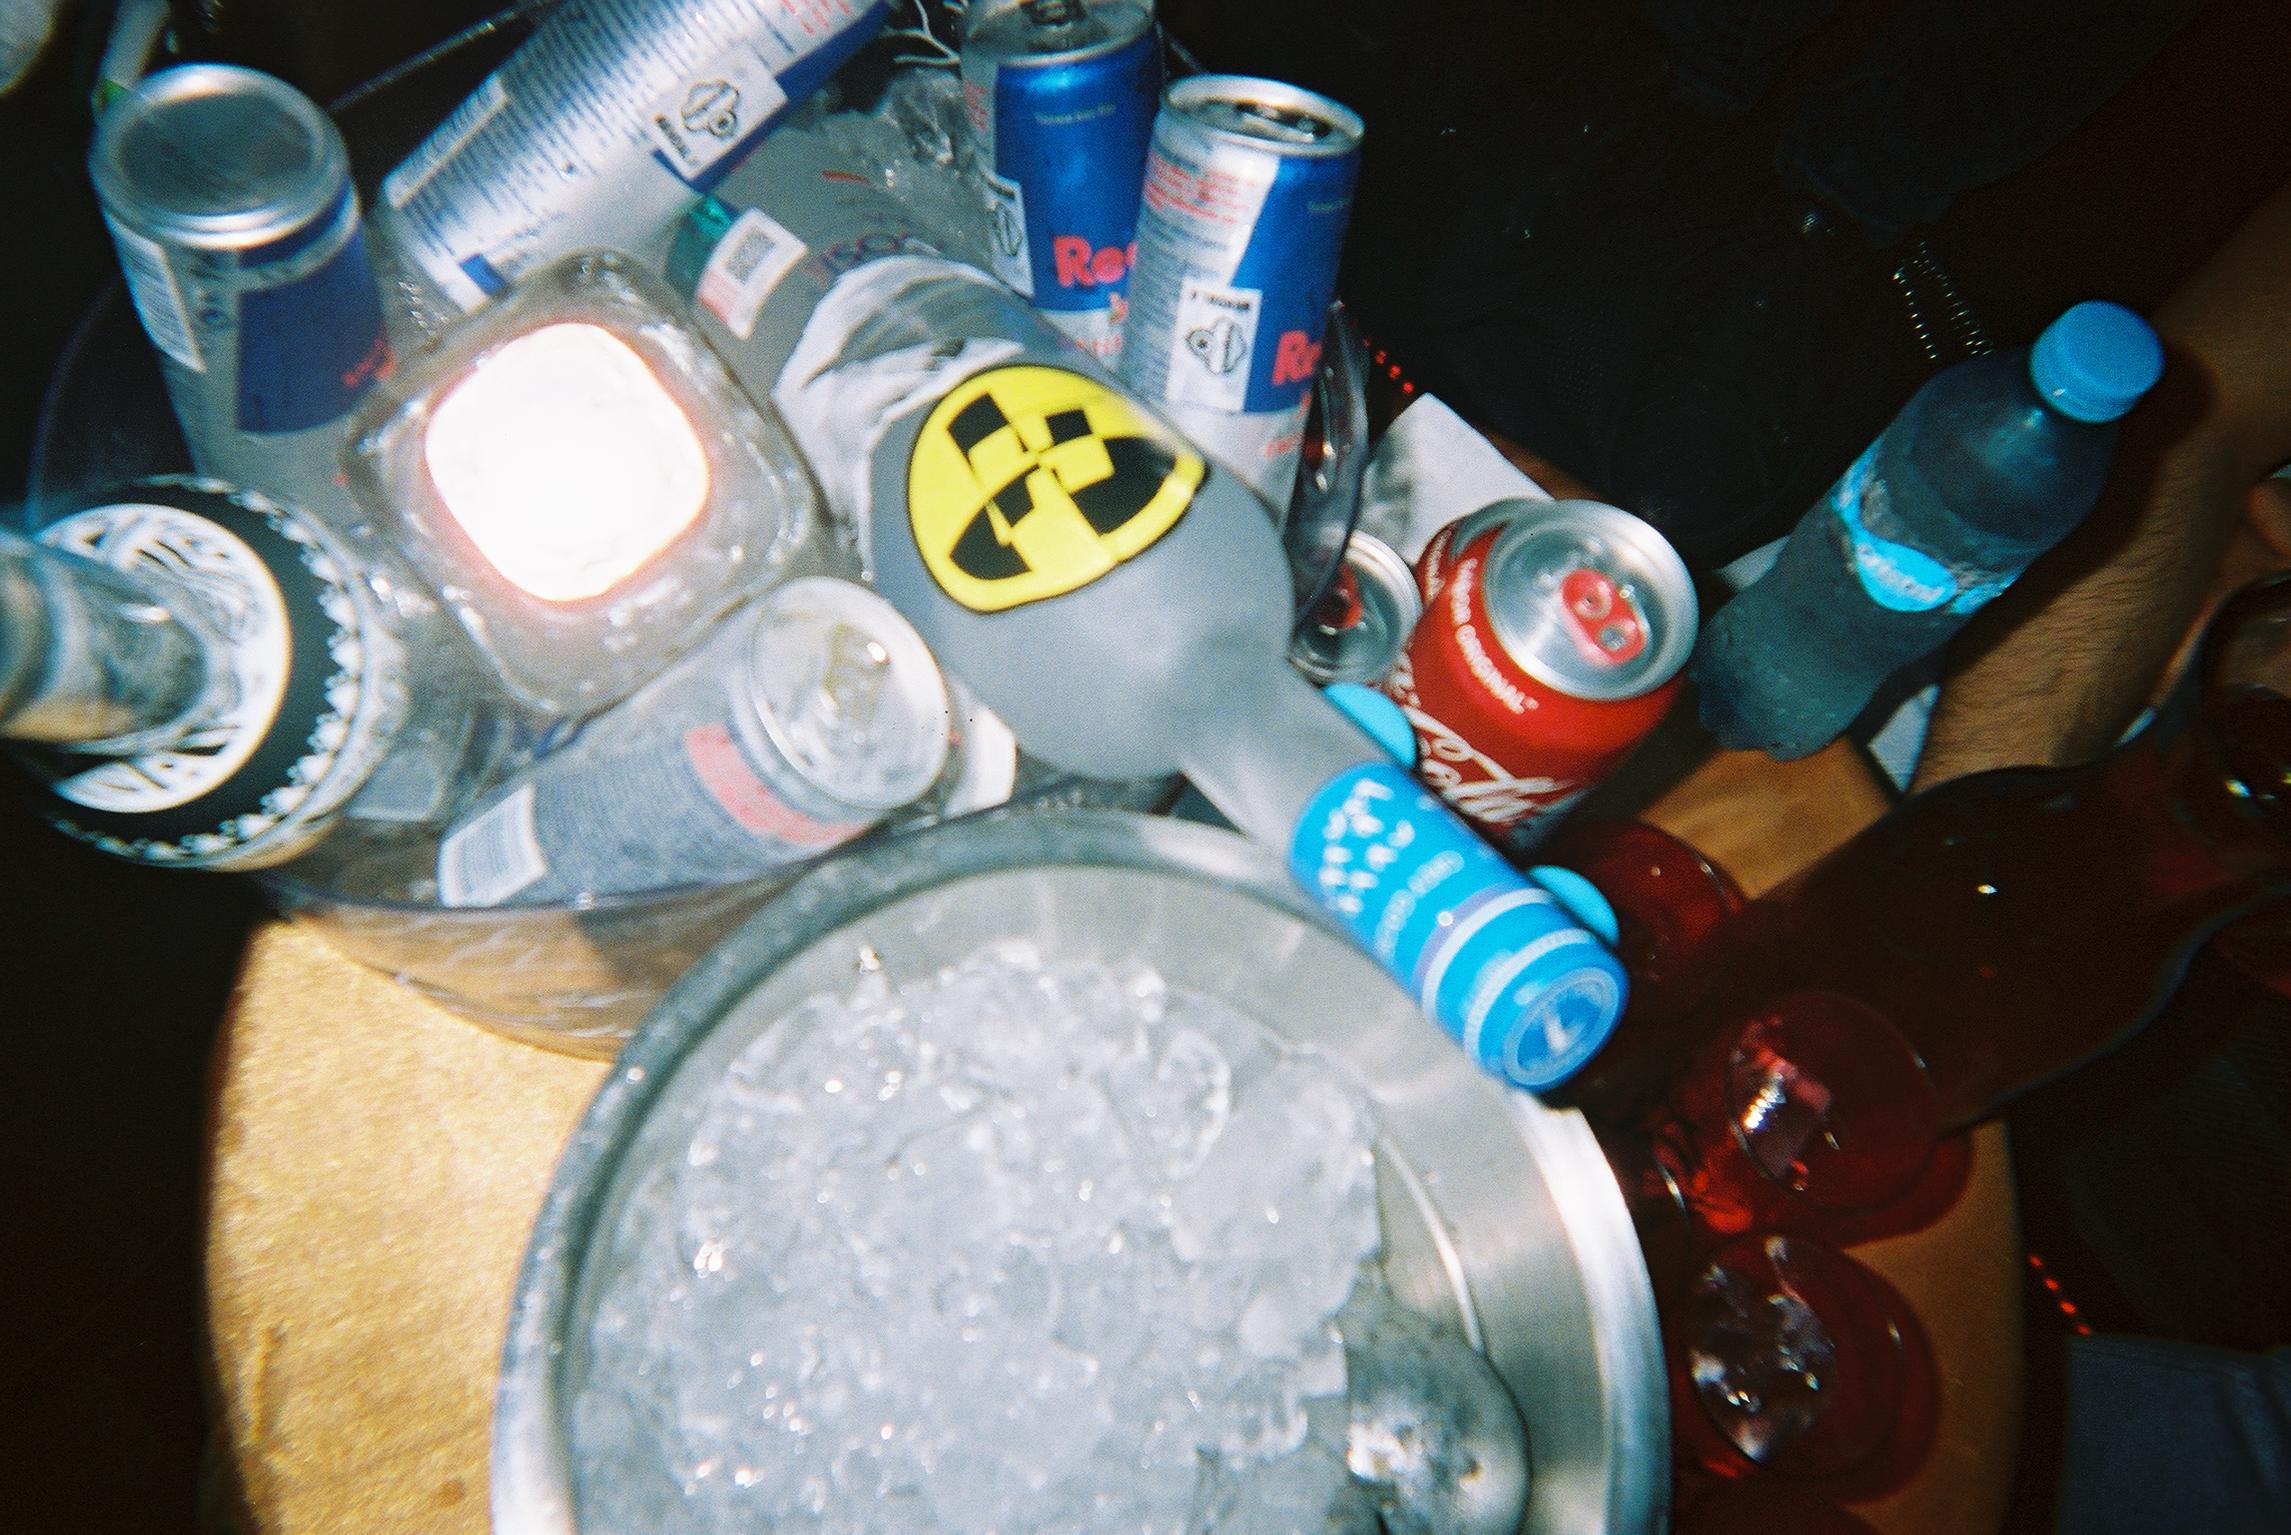 Hypend bottles